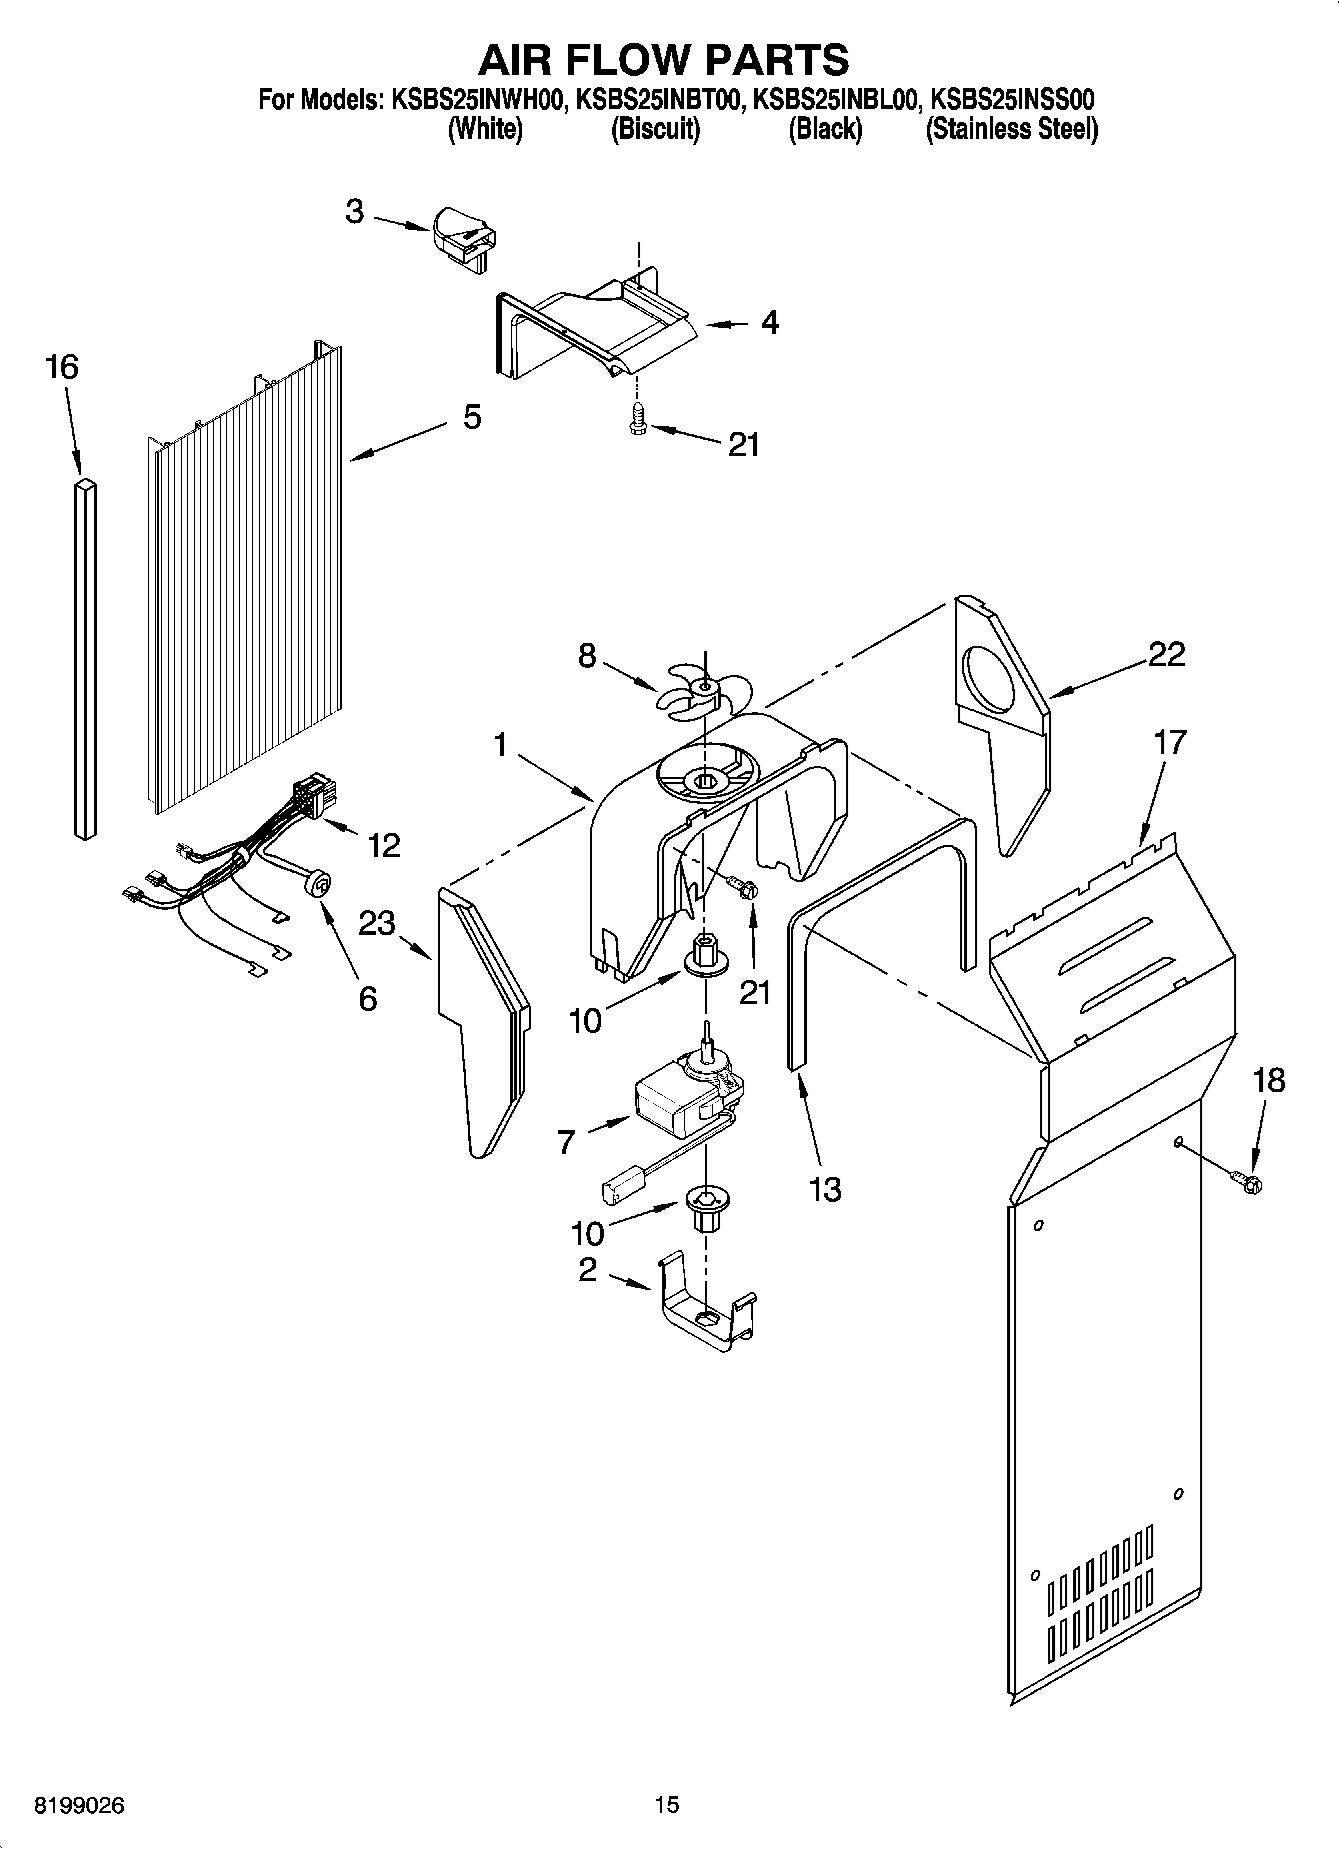 50 Kitchenaid Superba Refrigerator Parts Diagram Up2n